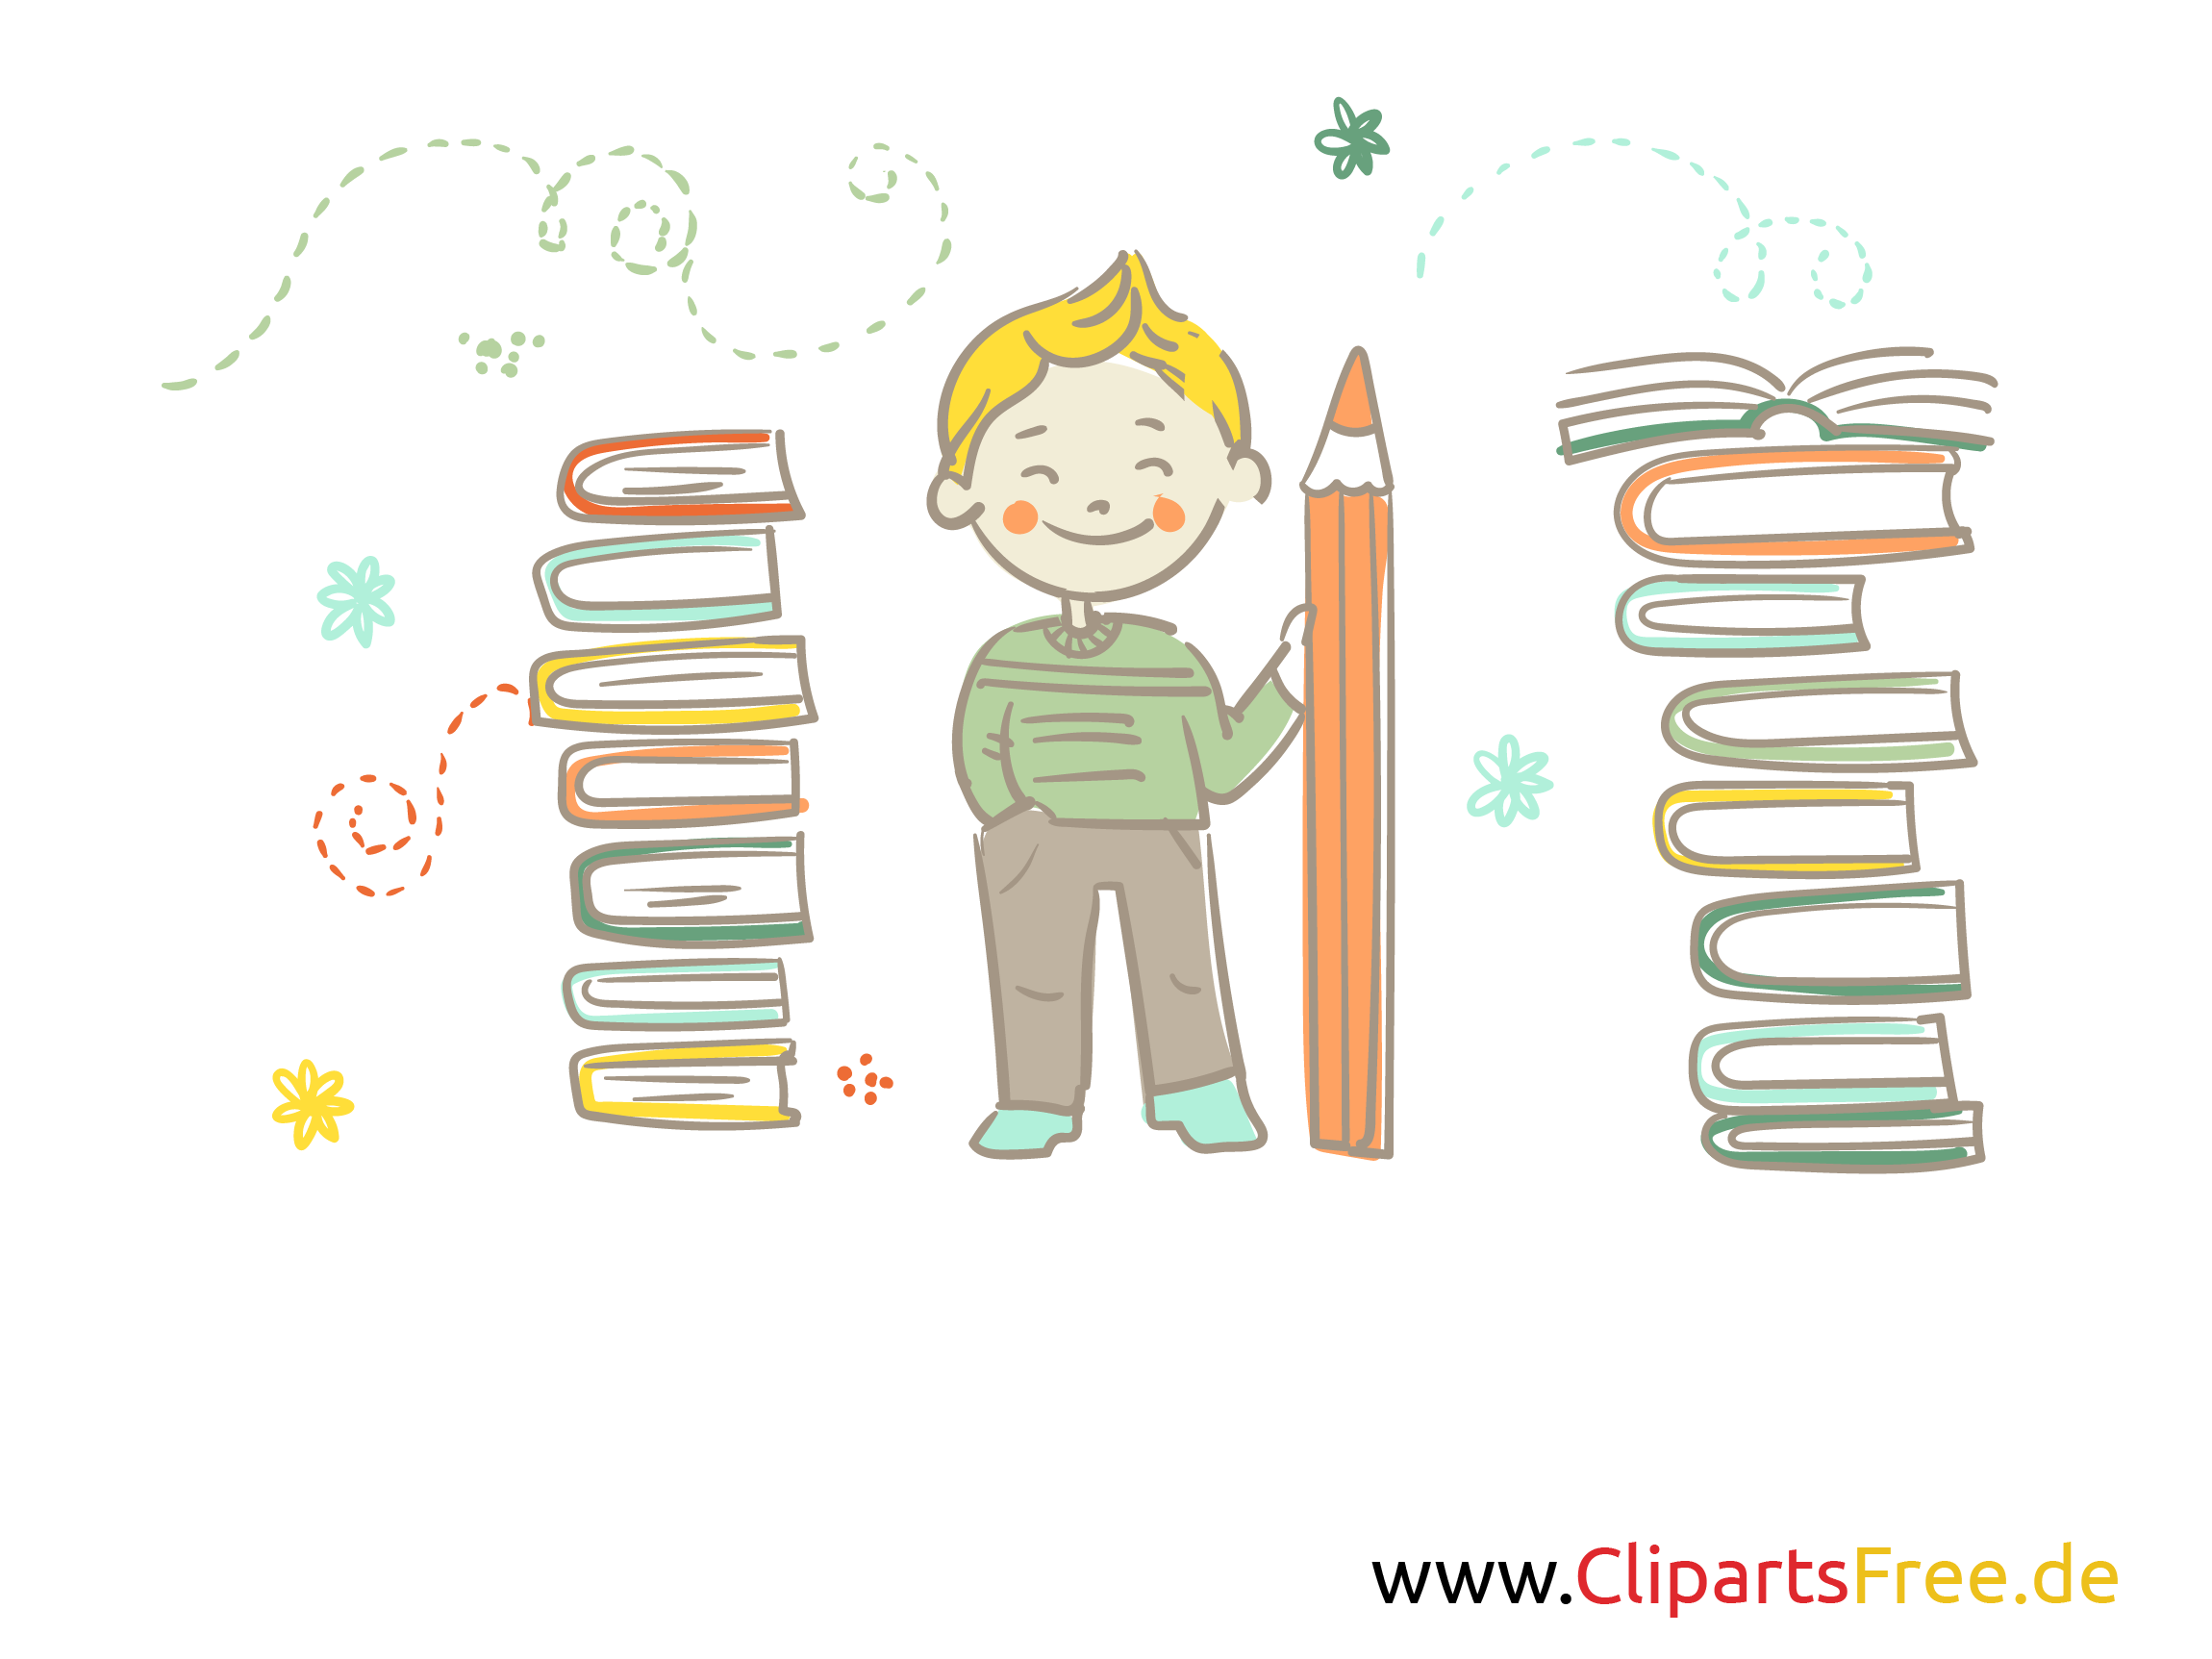 Schreiben lernen Clipart, Illustration, Cartoon, Comic